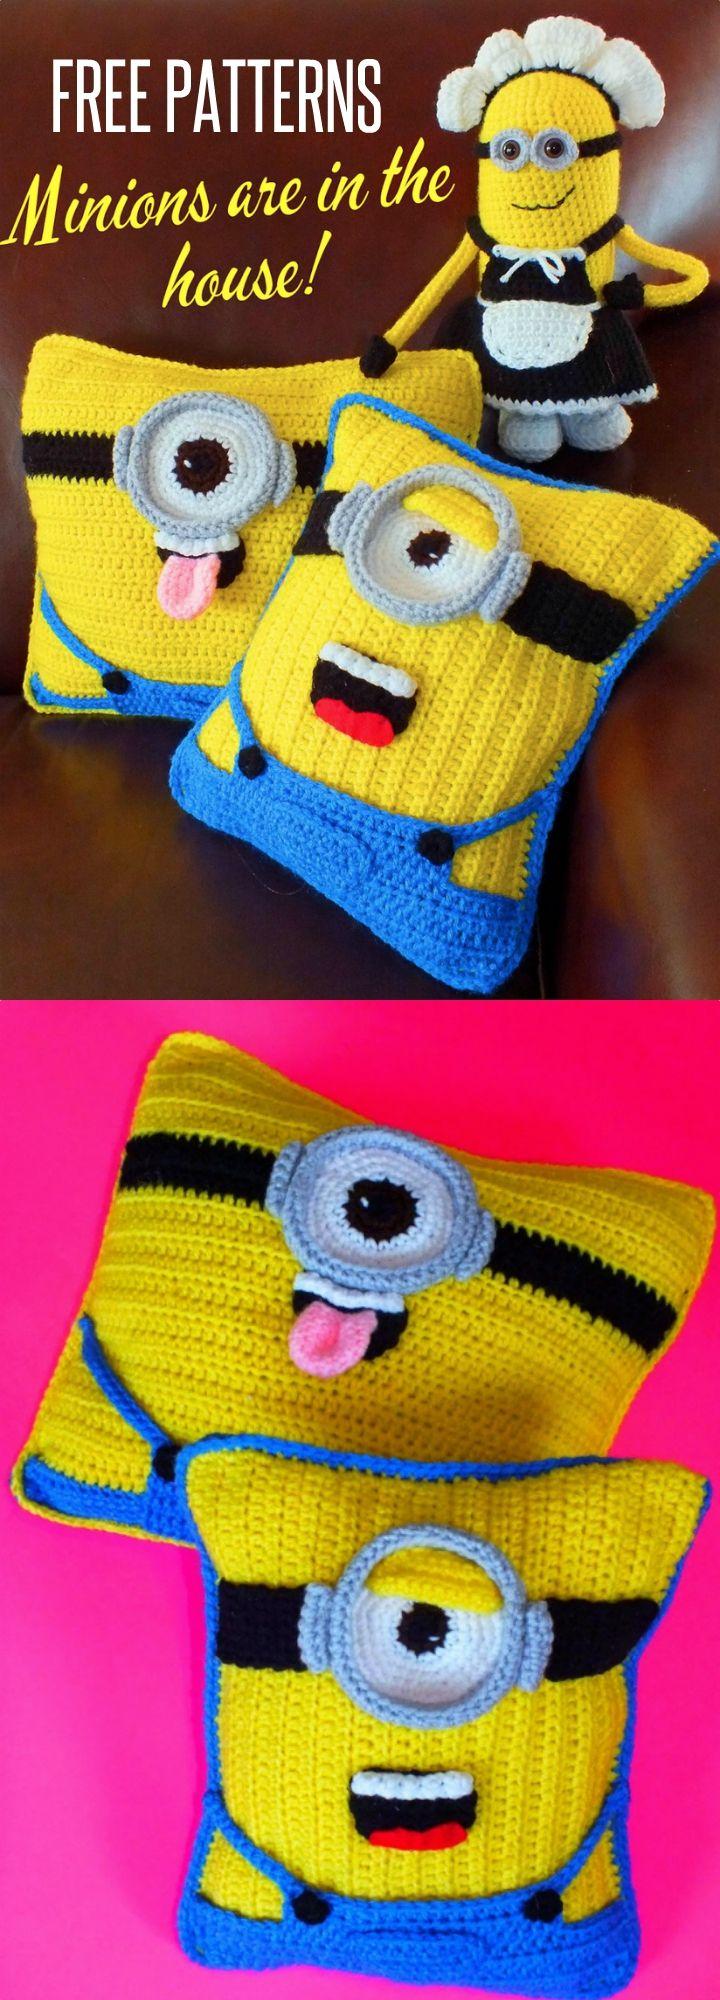 Crochet Minion Pillow Free Pattern All The Best Ideas